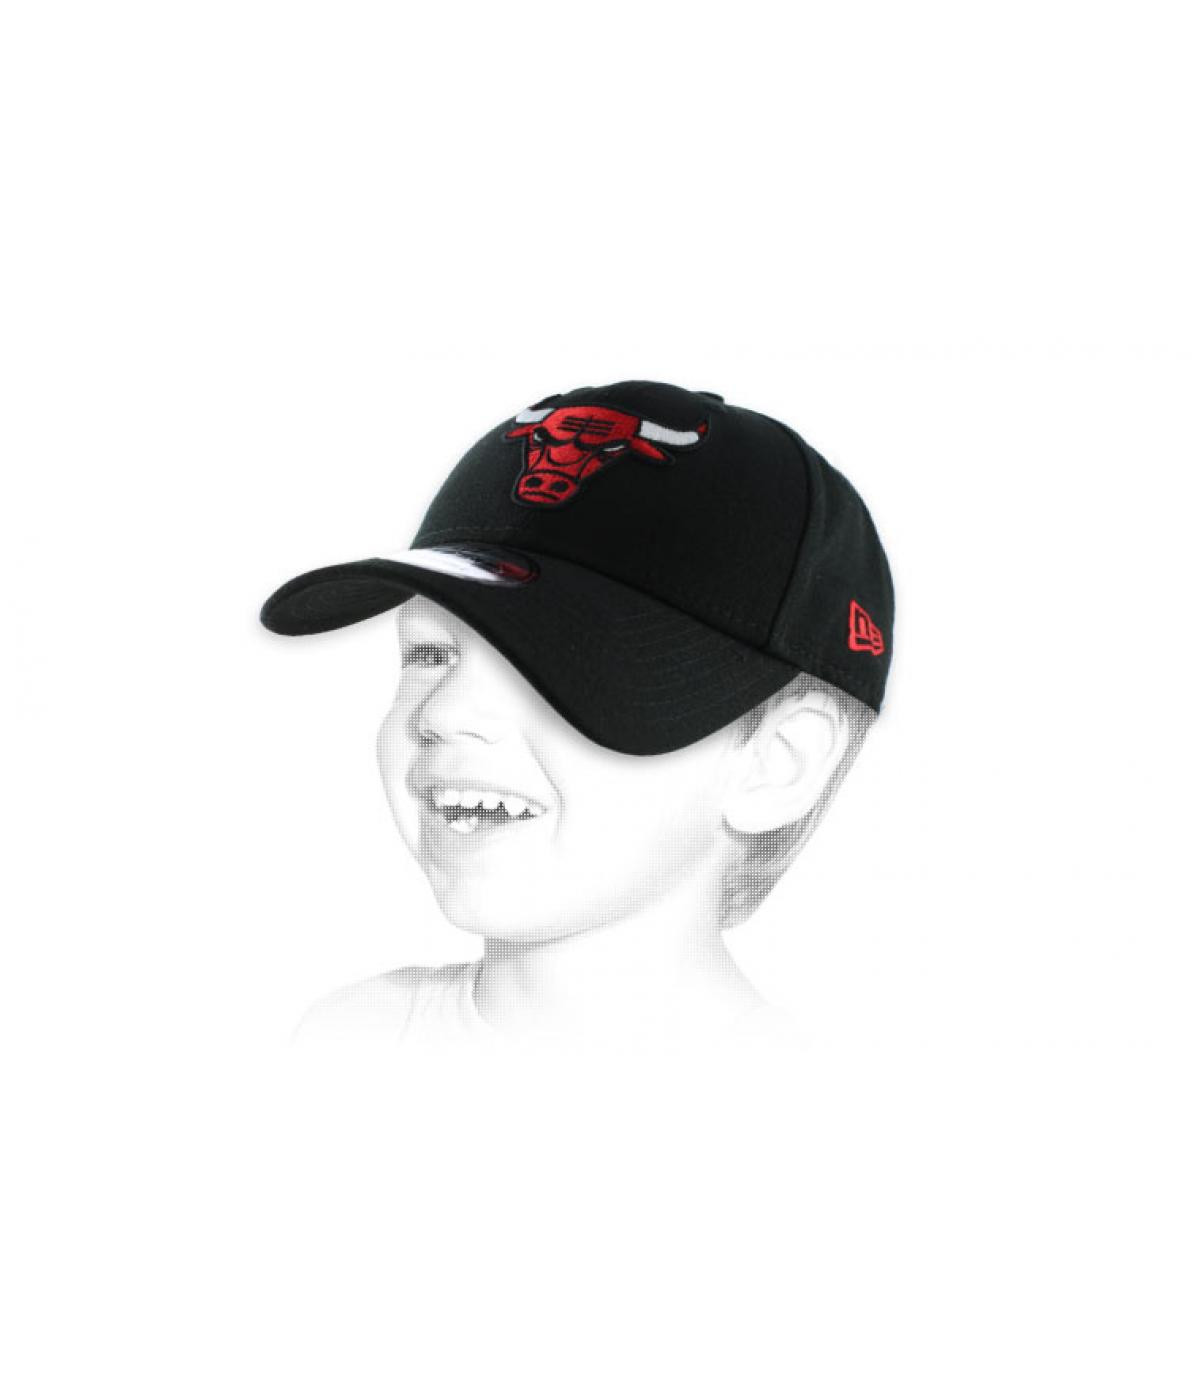 Kindercap Bulls schwarz